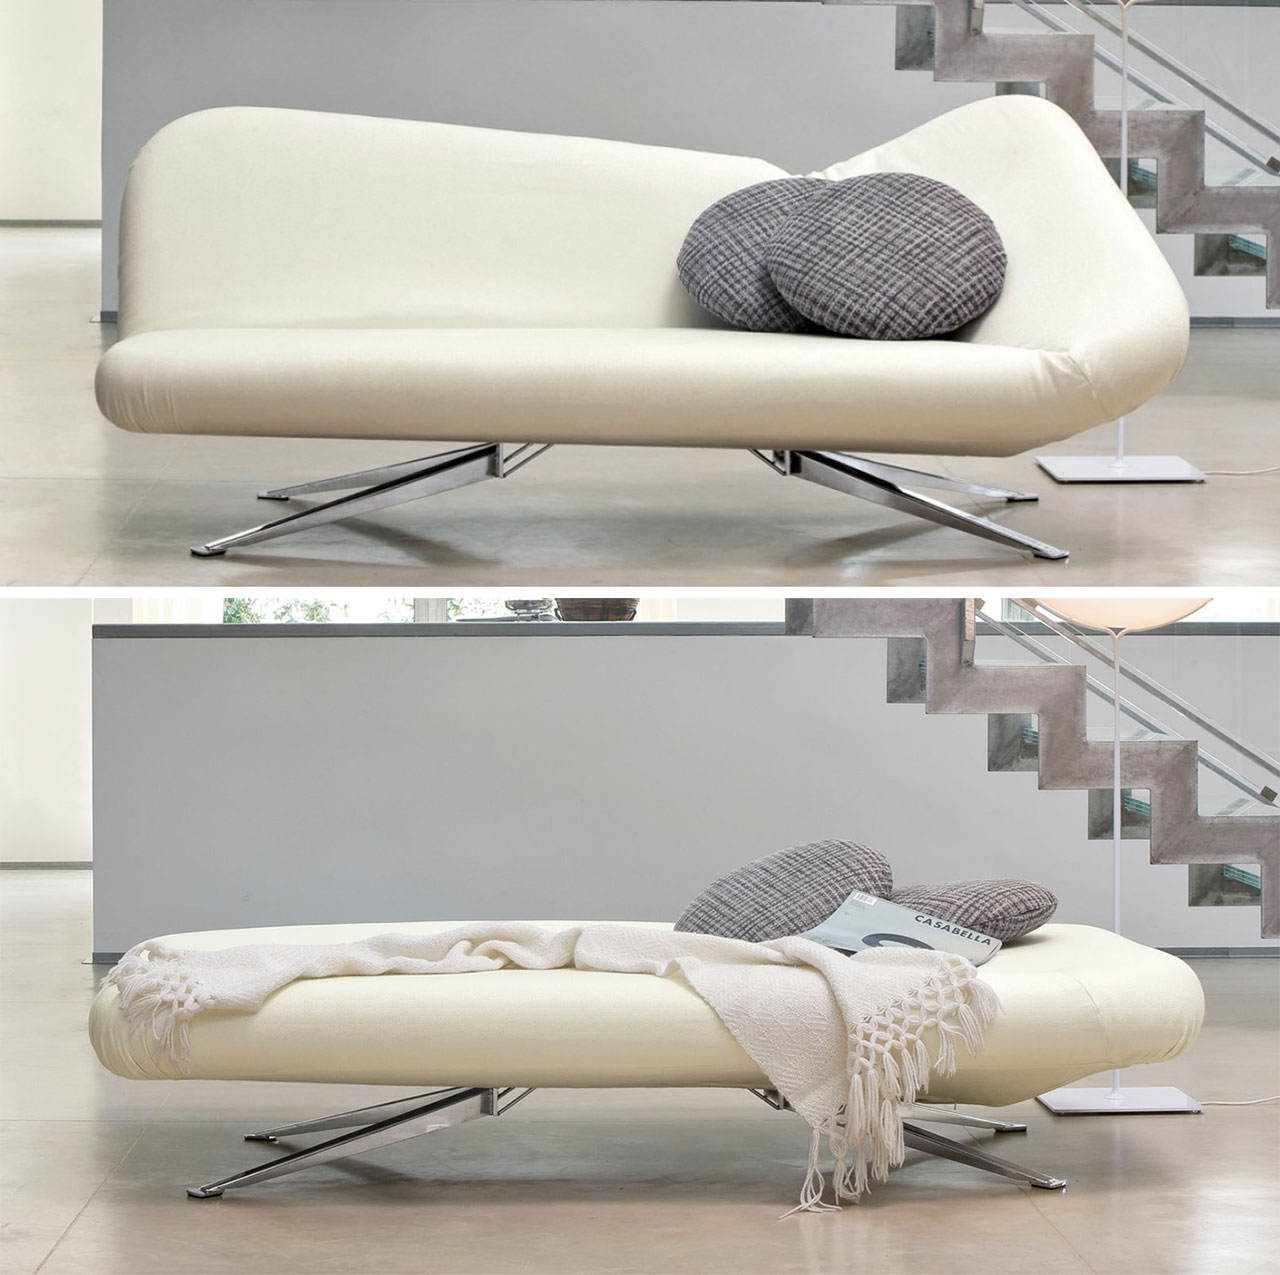 Papillon bonaldo divano trasformabile bianco.